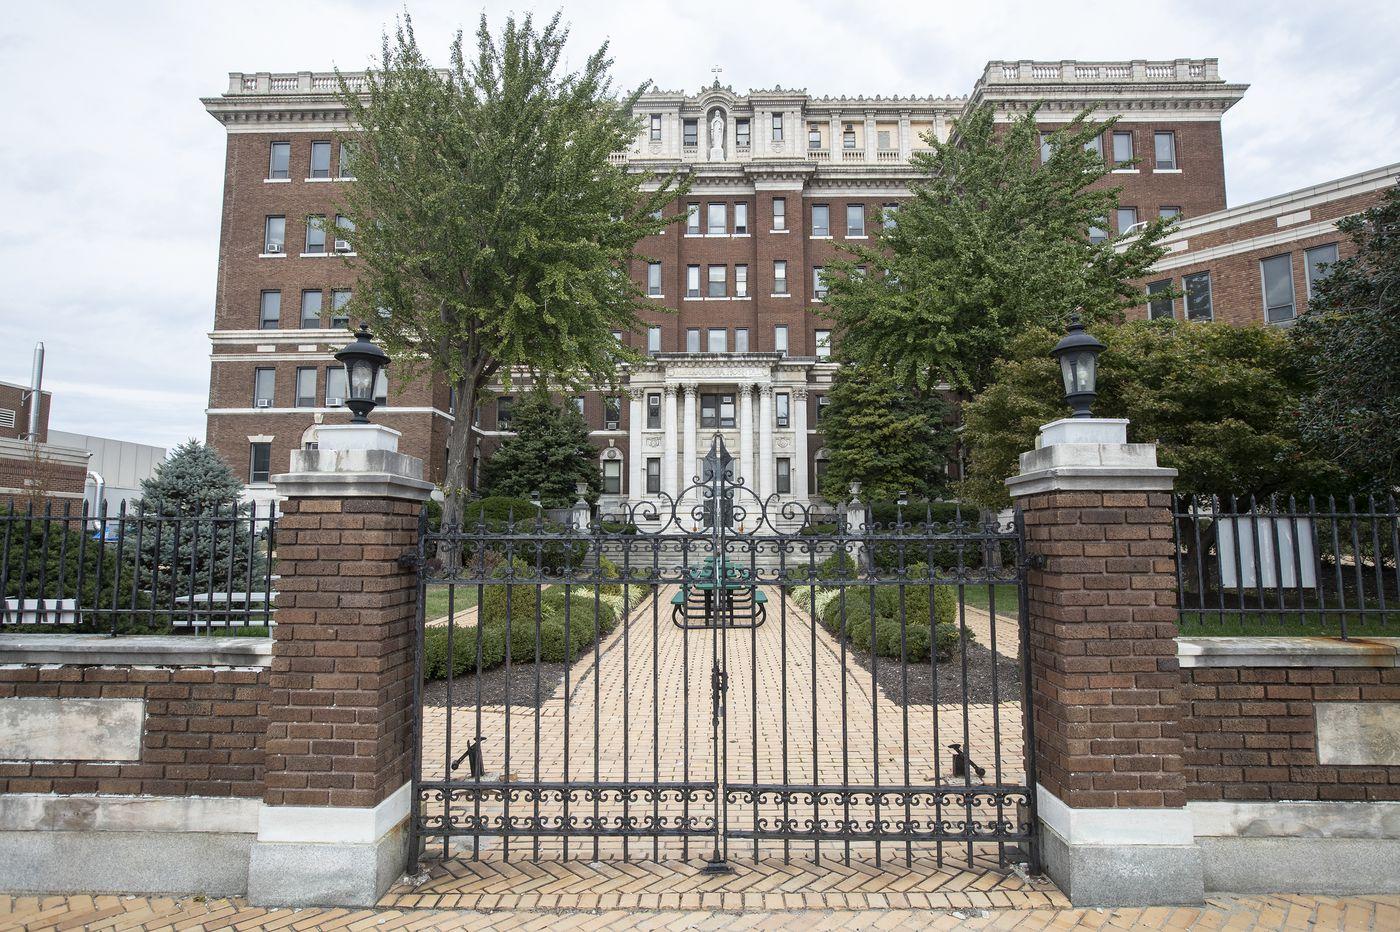 Mercy Philadelphia Hospital has new lease on life through Penn Medicine and other nonprofits